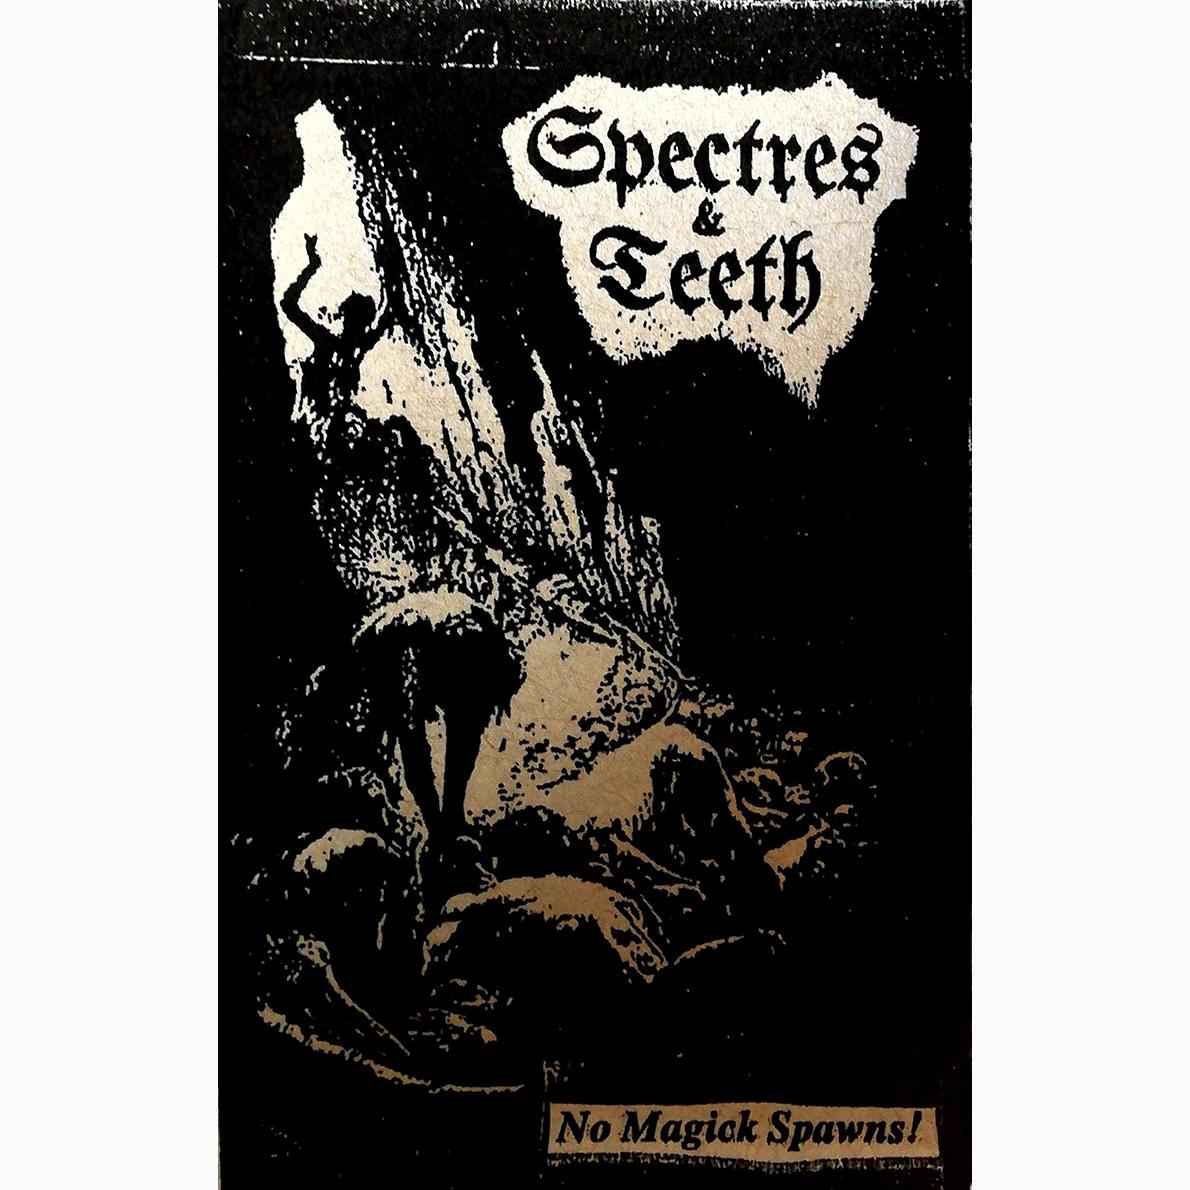 SPECTRES & TEETH - No Magick Spawns!